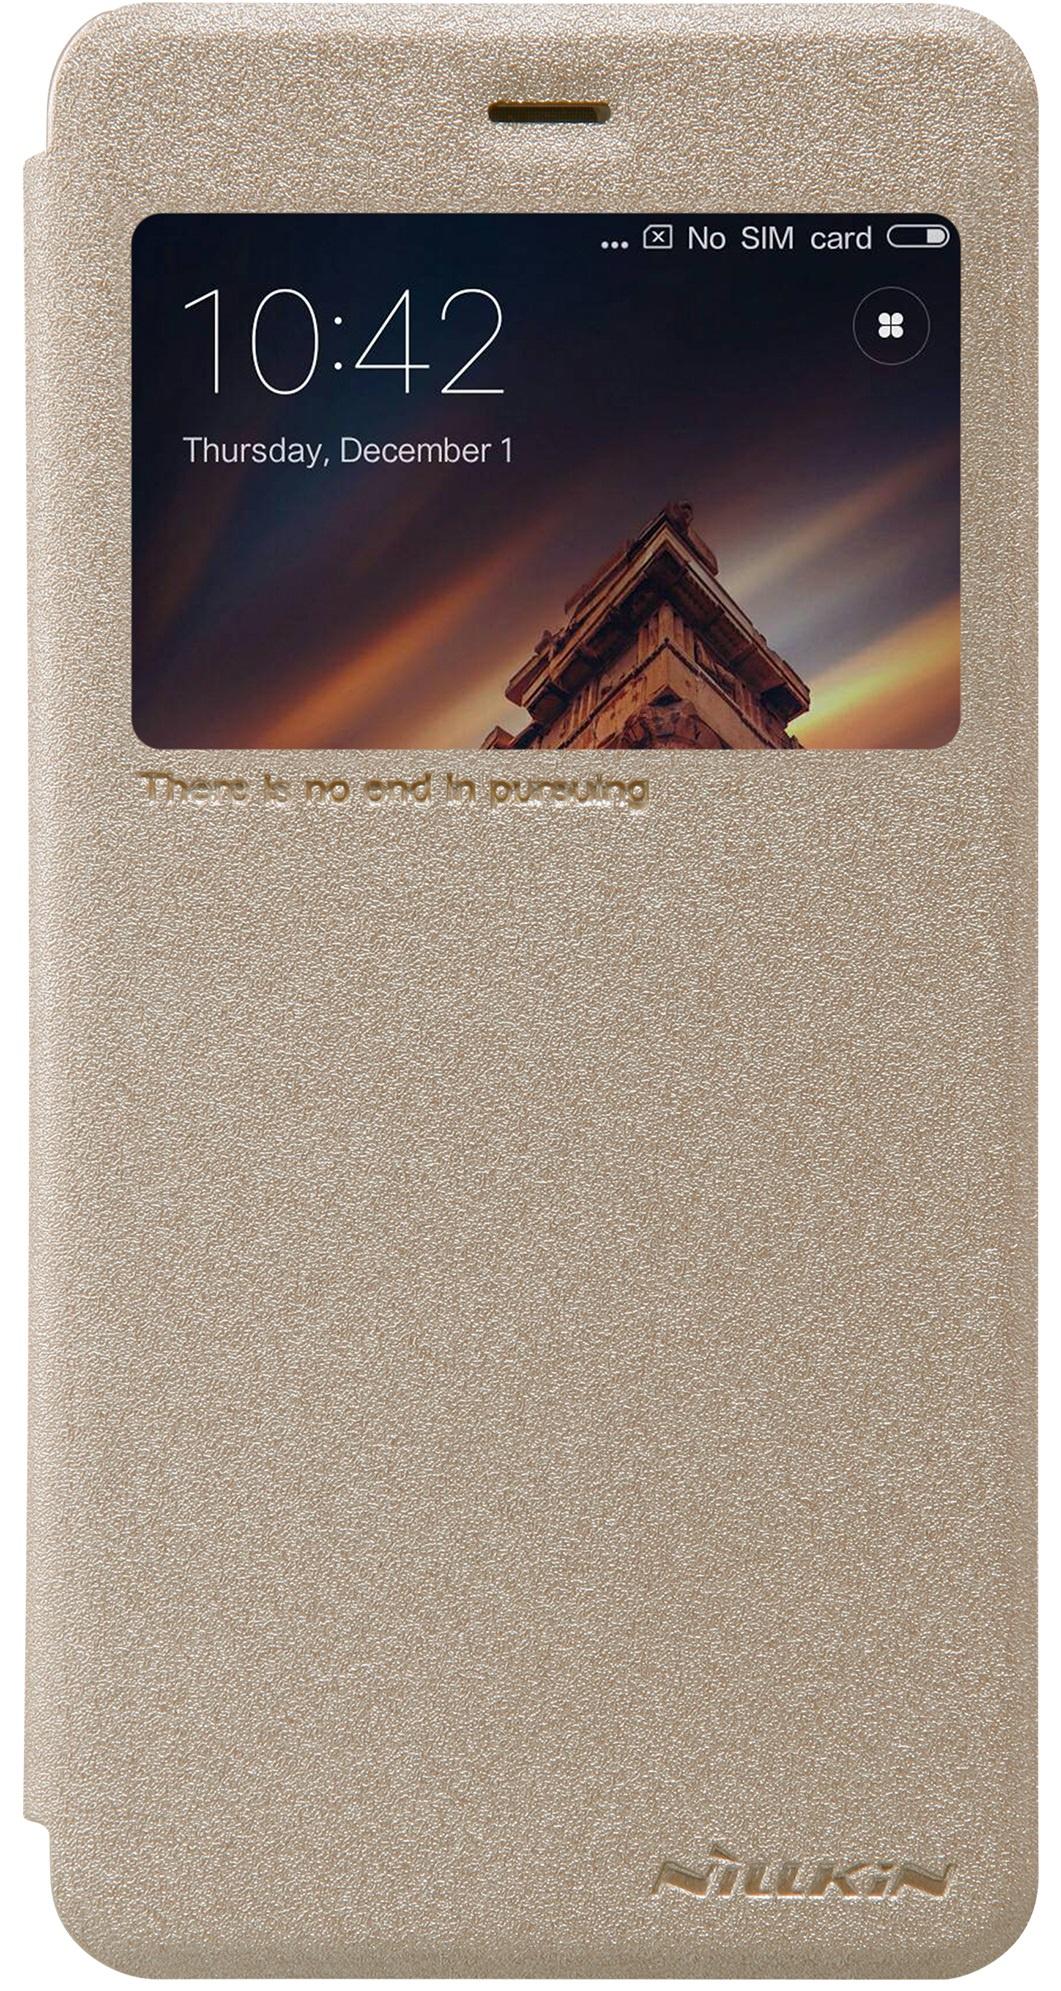 Чехол Nillkin Sparkle для Xiaomi RedMi 4A, 6902048134317, золотистый чехол nillkin sparkle для xiaomi redmi 4a 6902048134317 золотистый